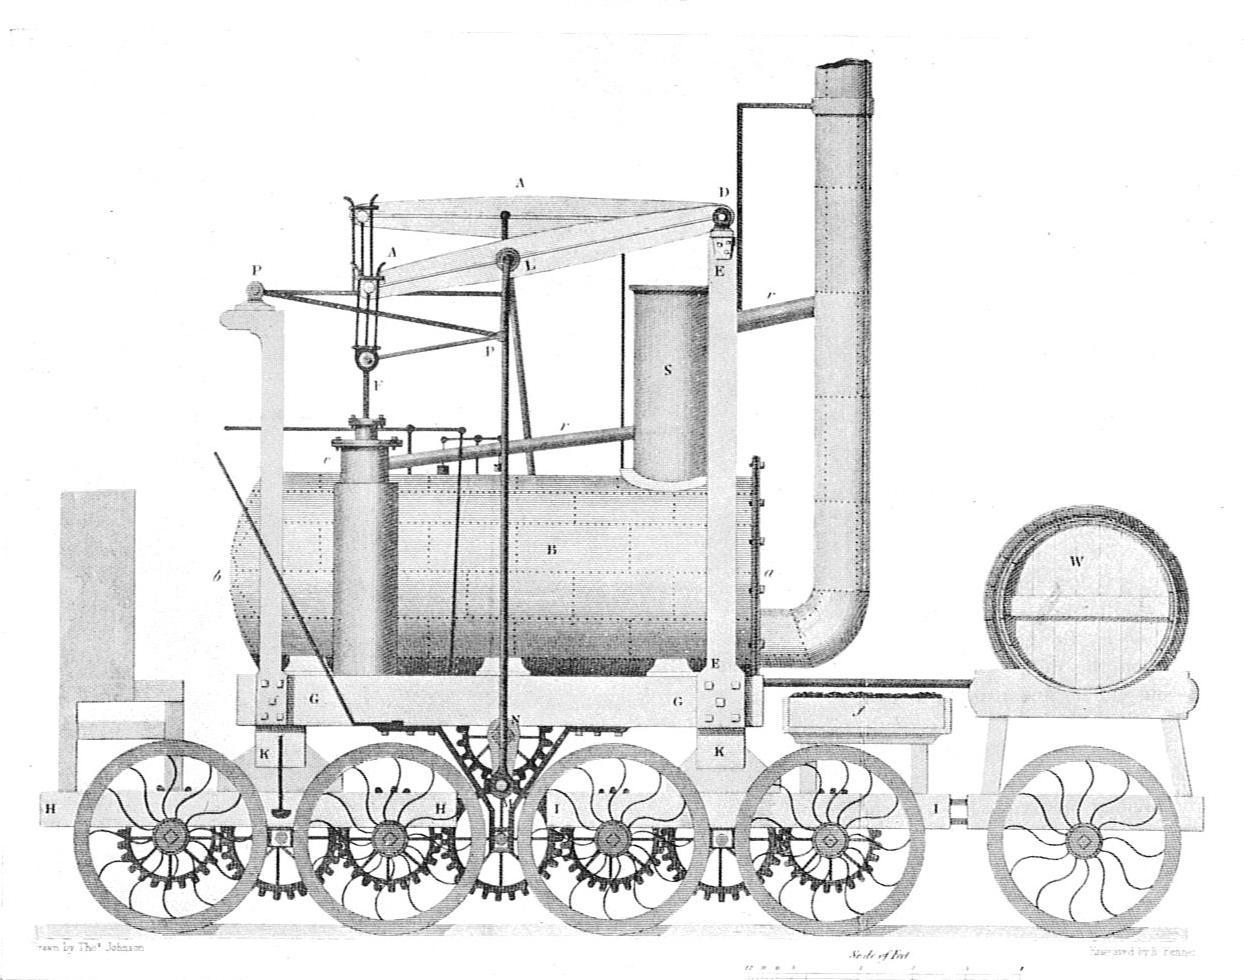 File:Hedley's 0-8-0 Wylam locomotive, 1813 (British Railway